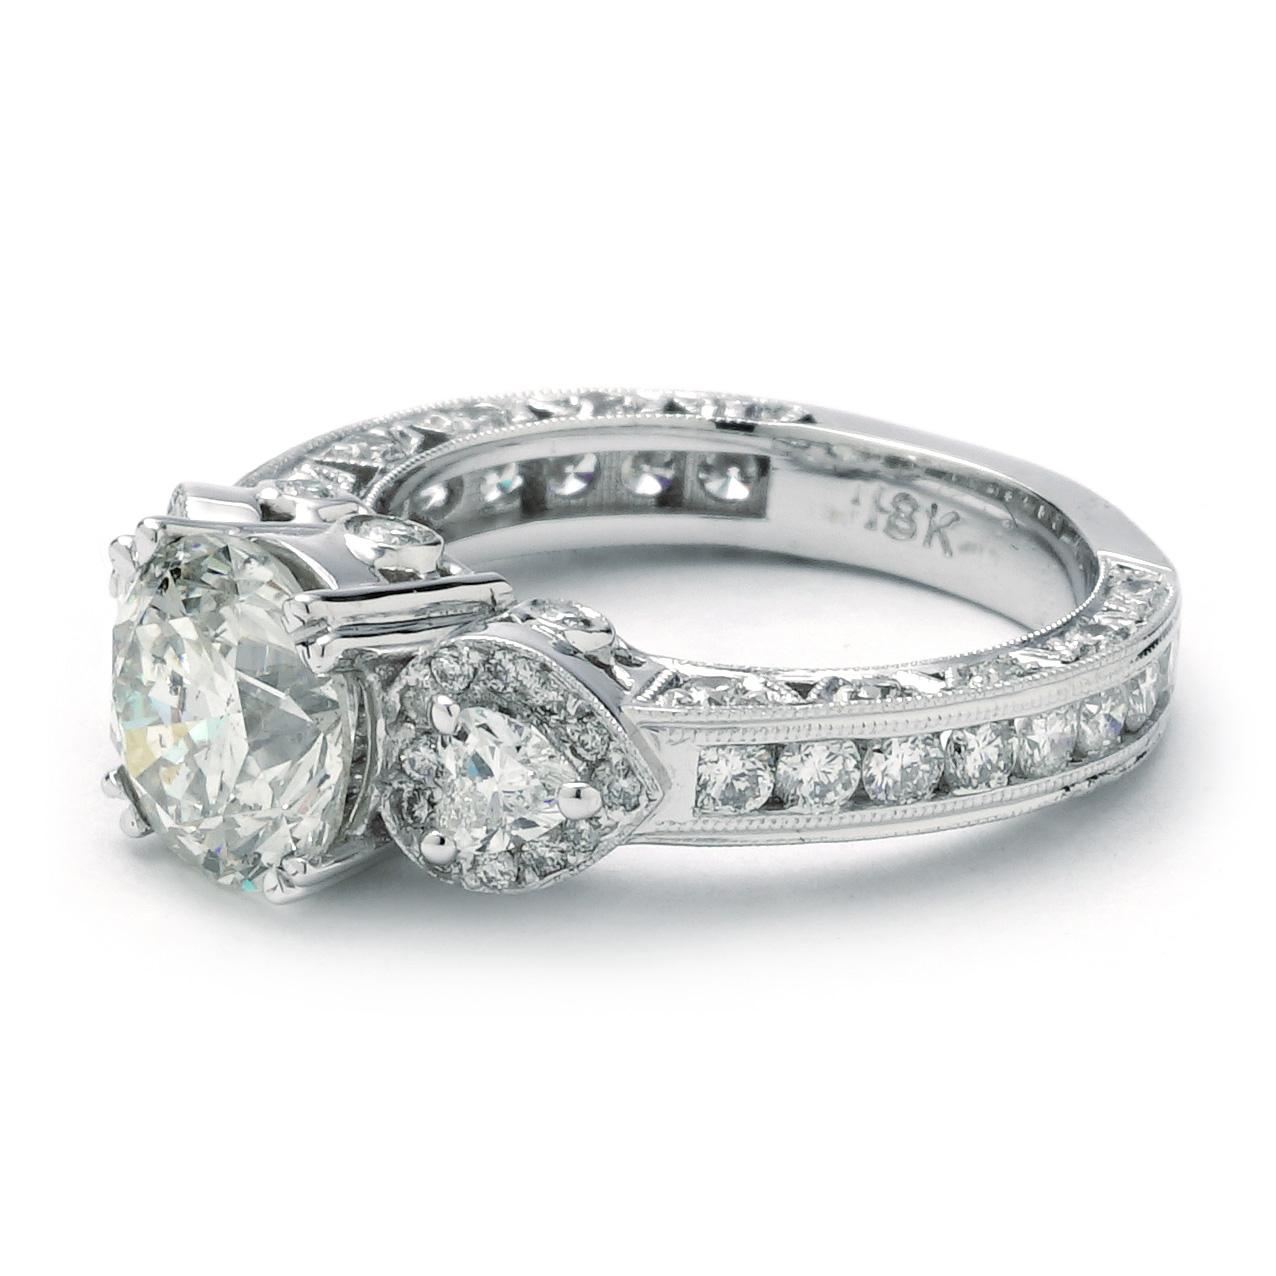 Gemstone Engagement Rings Chicago: Vintage Styled Three Stone Round Center Engagement Ring